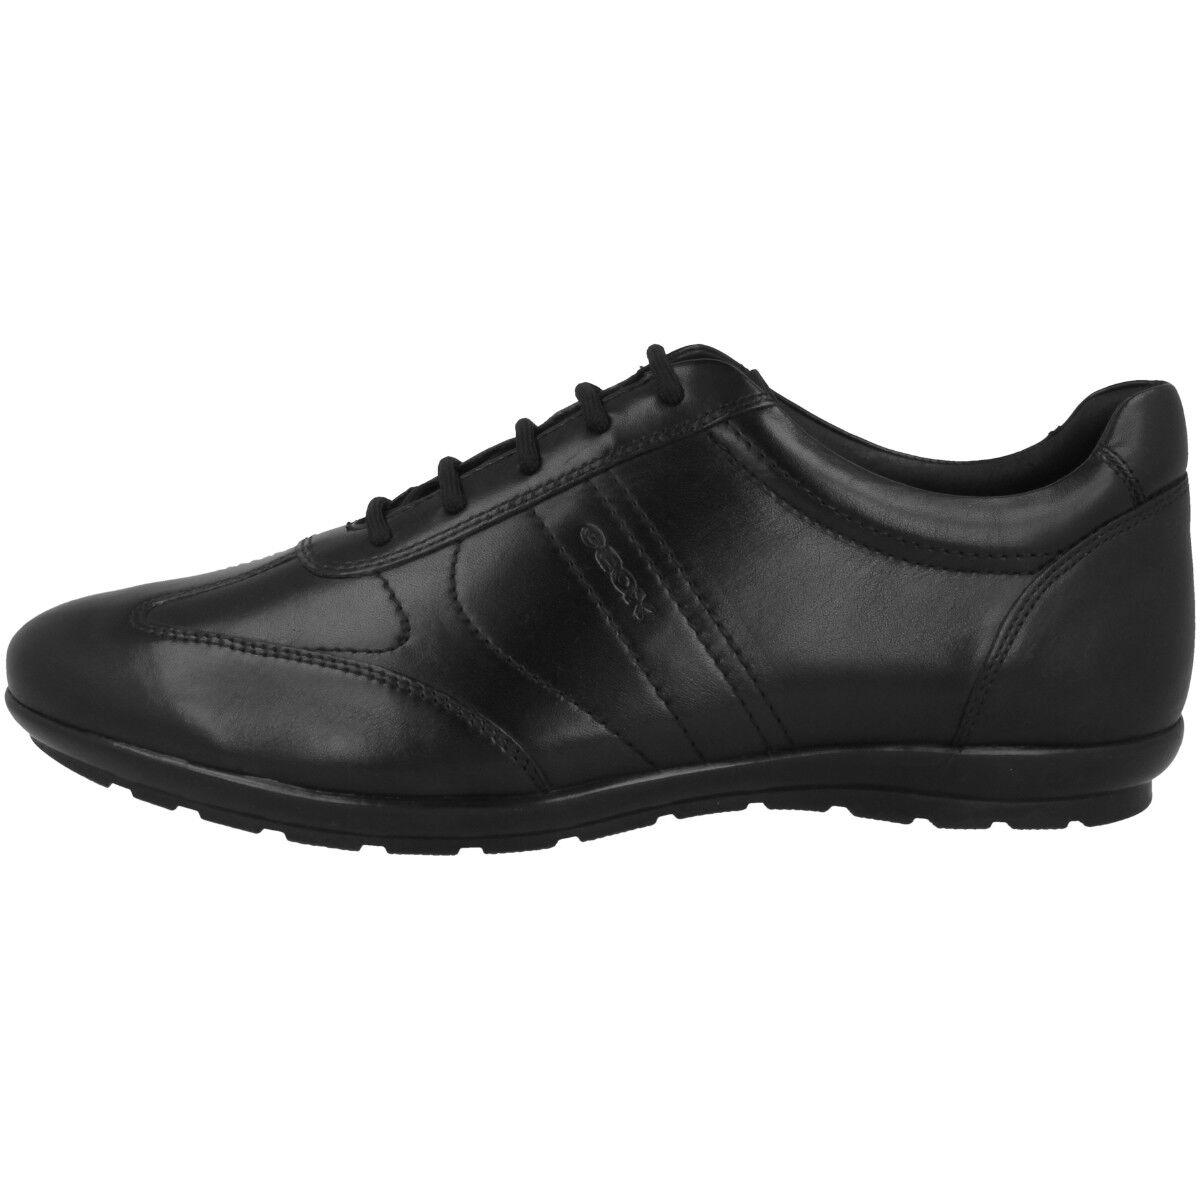 Zapatos de mujer baratos zapatos de mujer Geox u símbolo b zapatos caballero zapatos abotinados schnürschuhe cortos u74a5b00043c9999